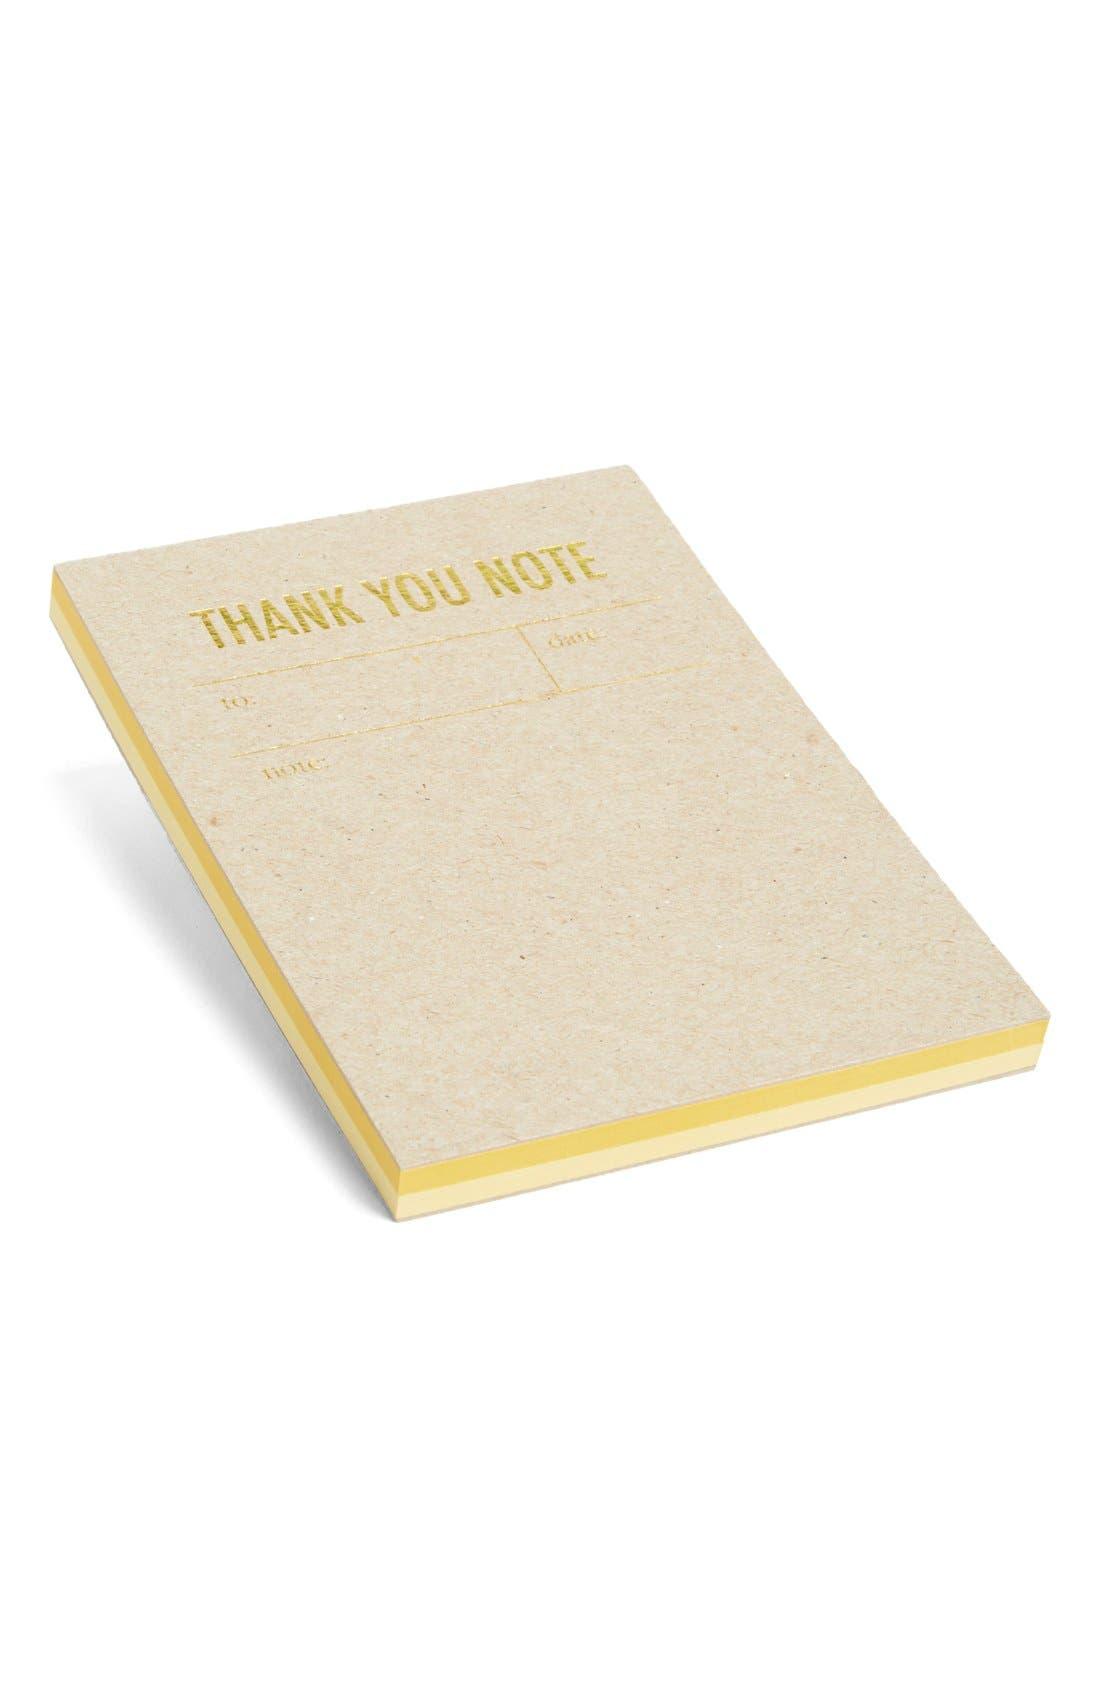 Main Image - Tokketok 'Thank You Note' Letterpress Note Cards (Set of 30)